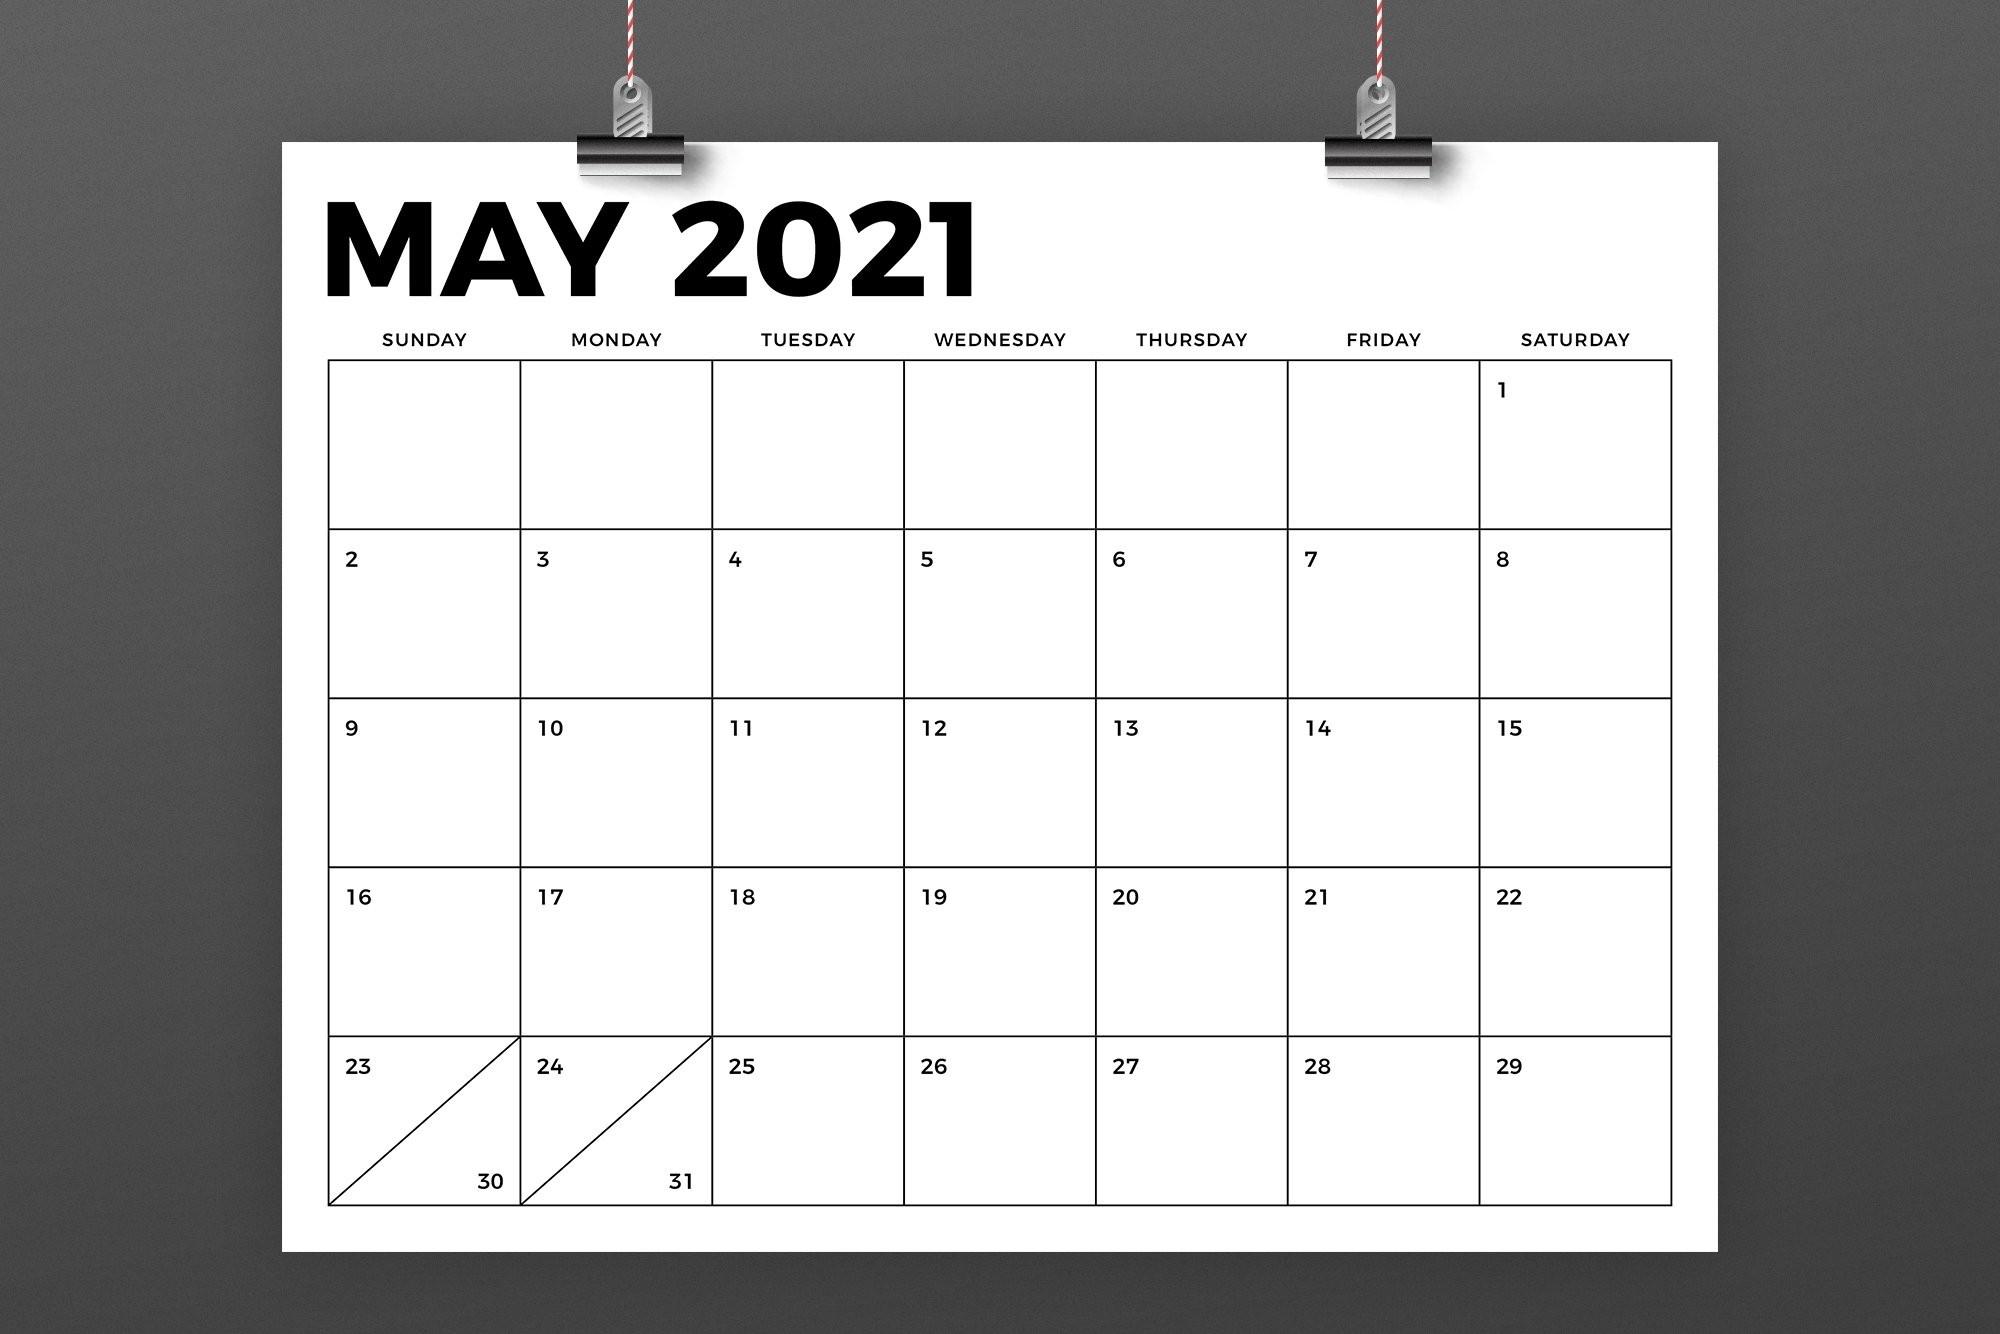 8.5 X 11 Inch Bold 2021 Calendar (438443) | Flyers | Design Bundles-Printable October 2021 Calendar On An 8.5 X 11Paper